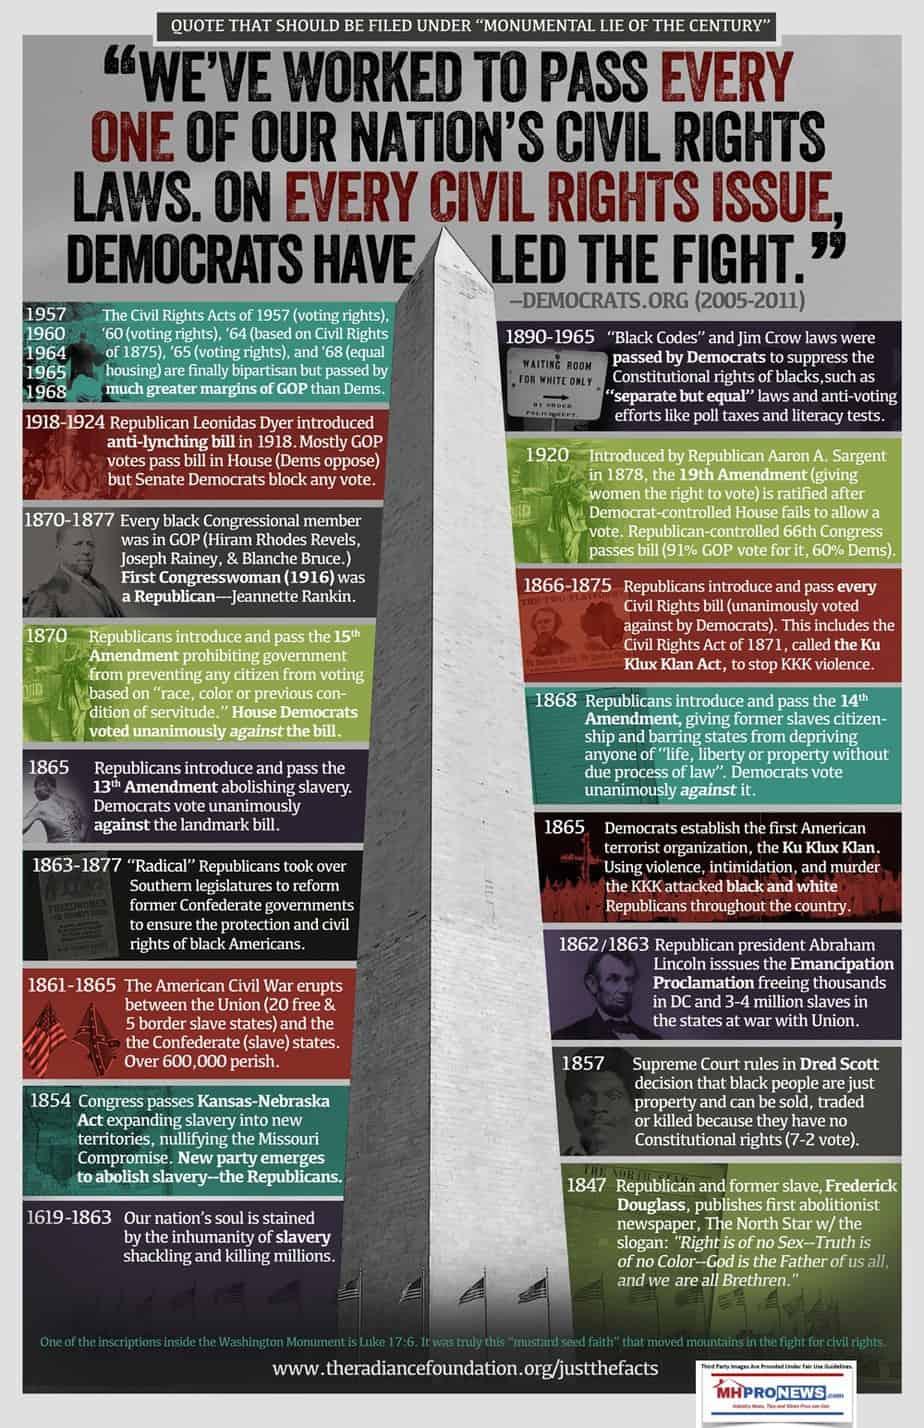 CivilRightSlaveryRadianceFoundationJustTheFactsDemocratsRepublicansDailyBusinessNewsMHProNews